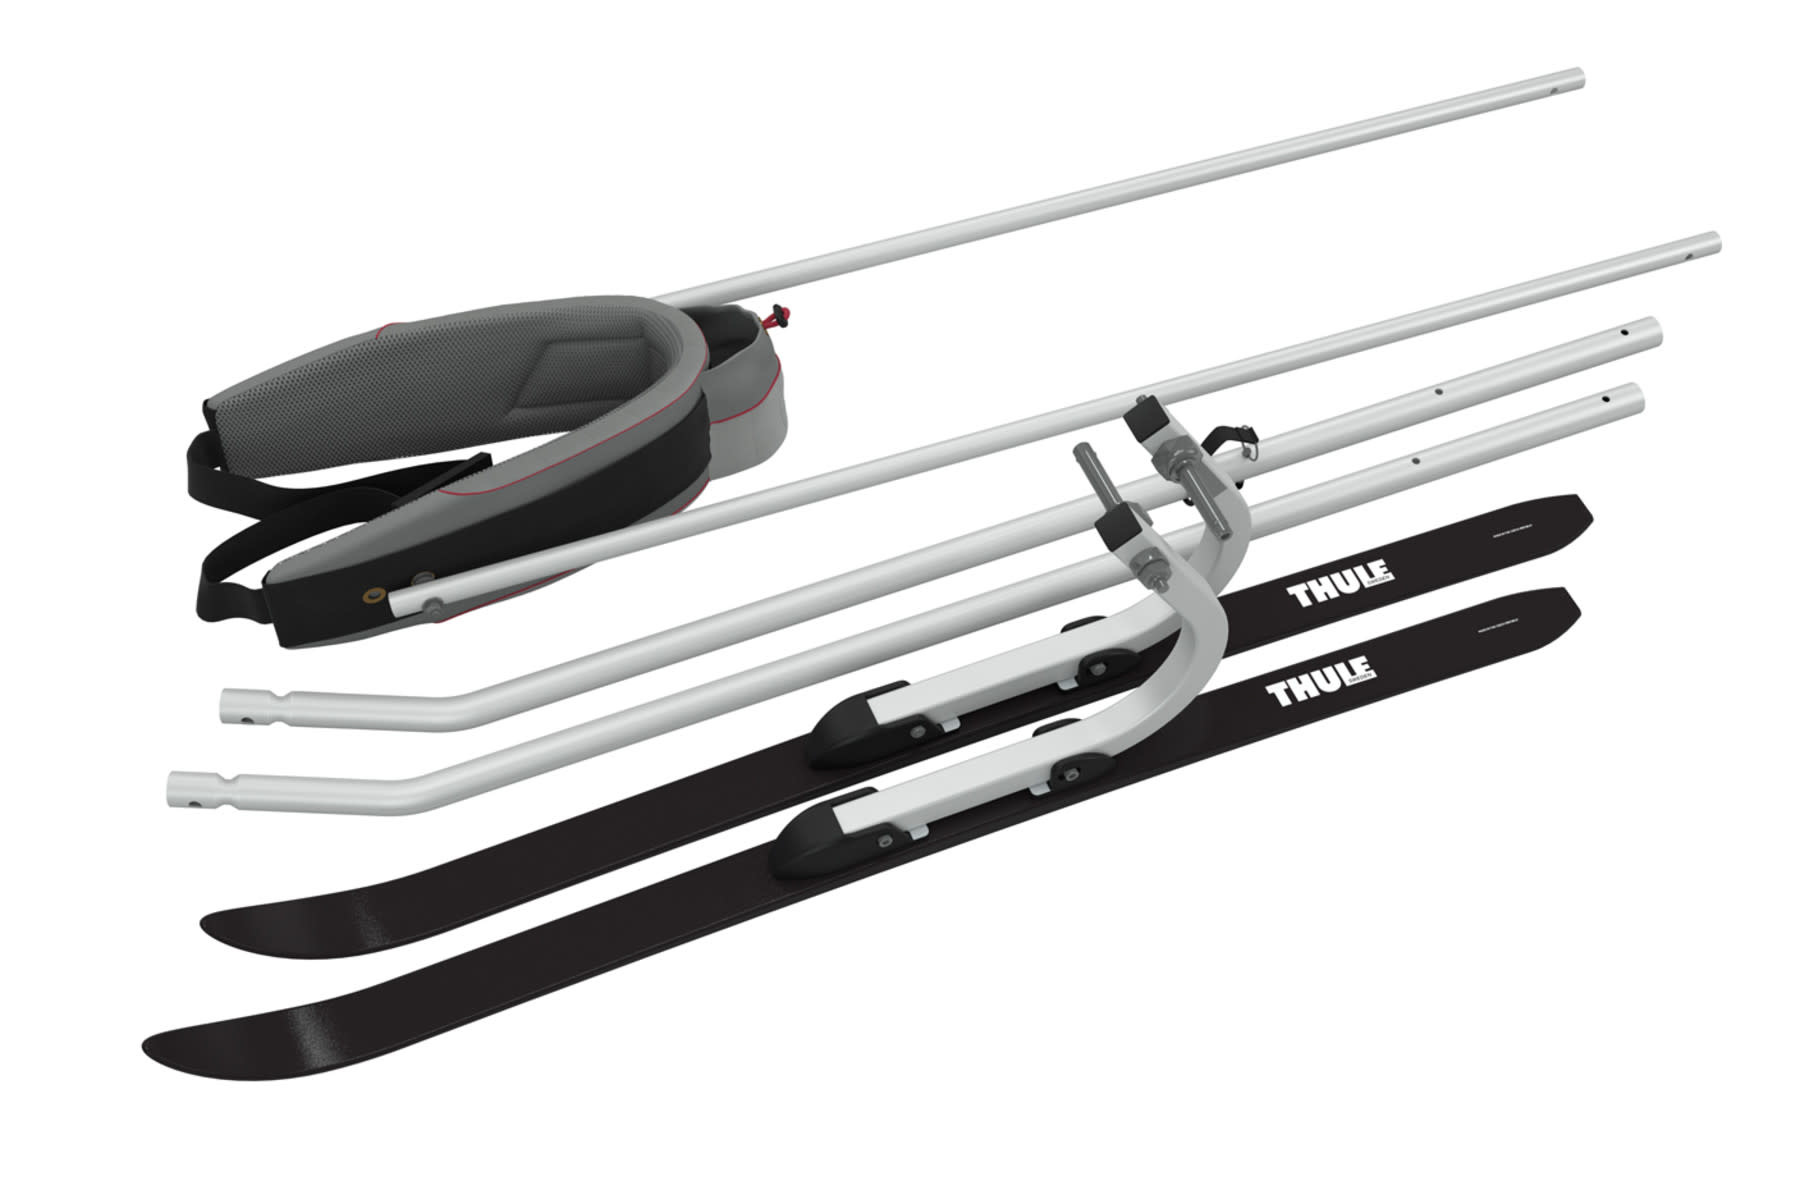 Ensemble de Skis Thule Cross Country usagé